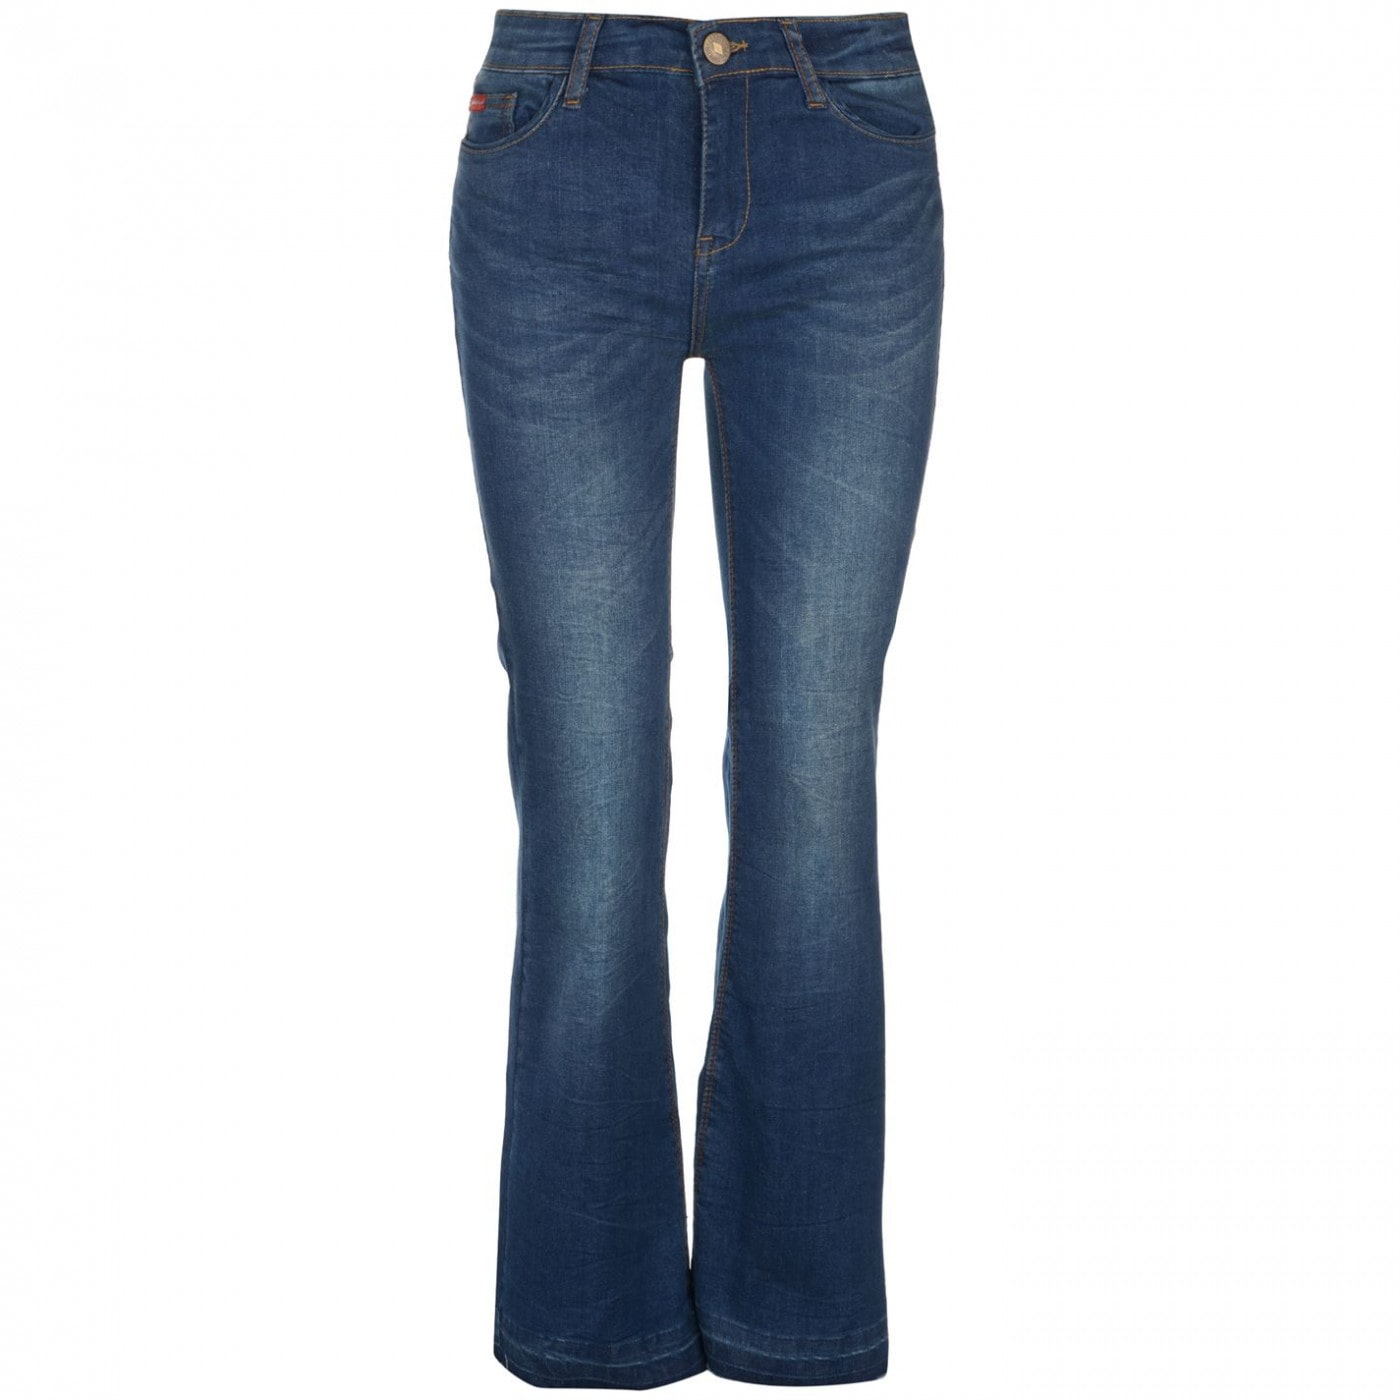 Lee Cooper Flare Hem Jeans Ladies